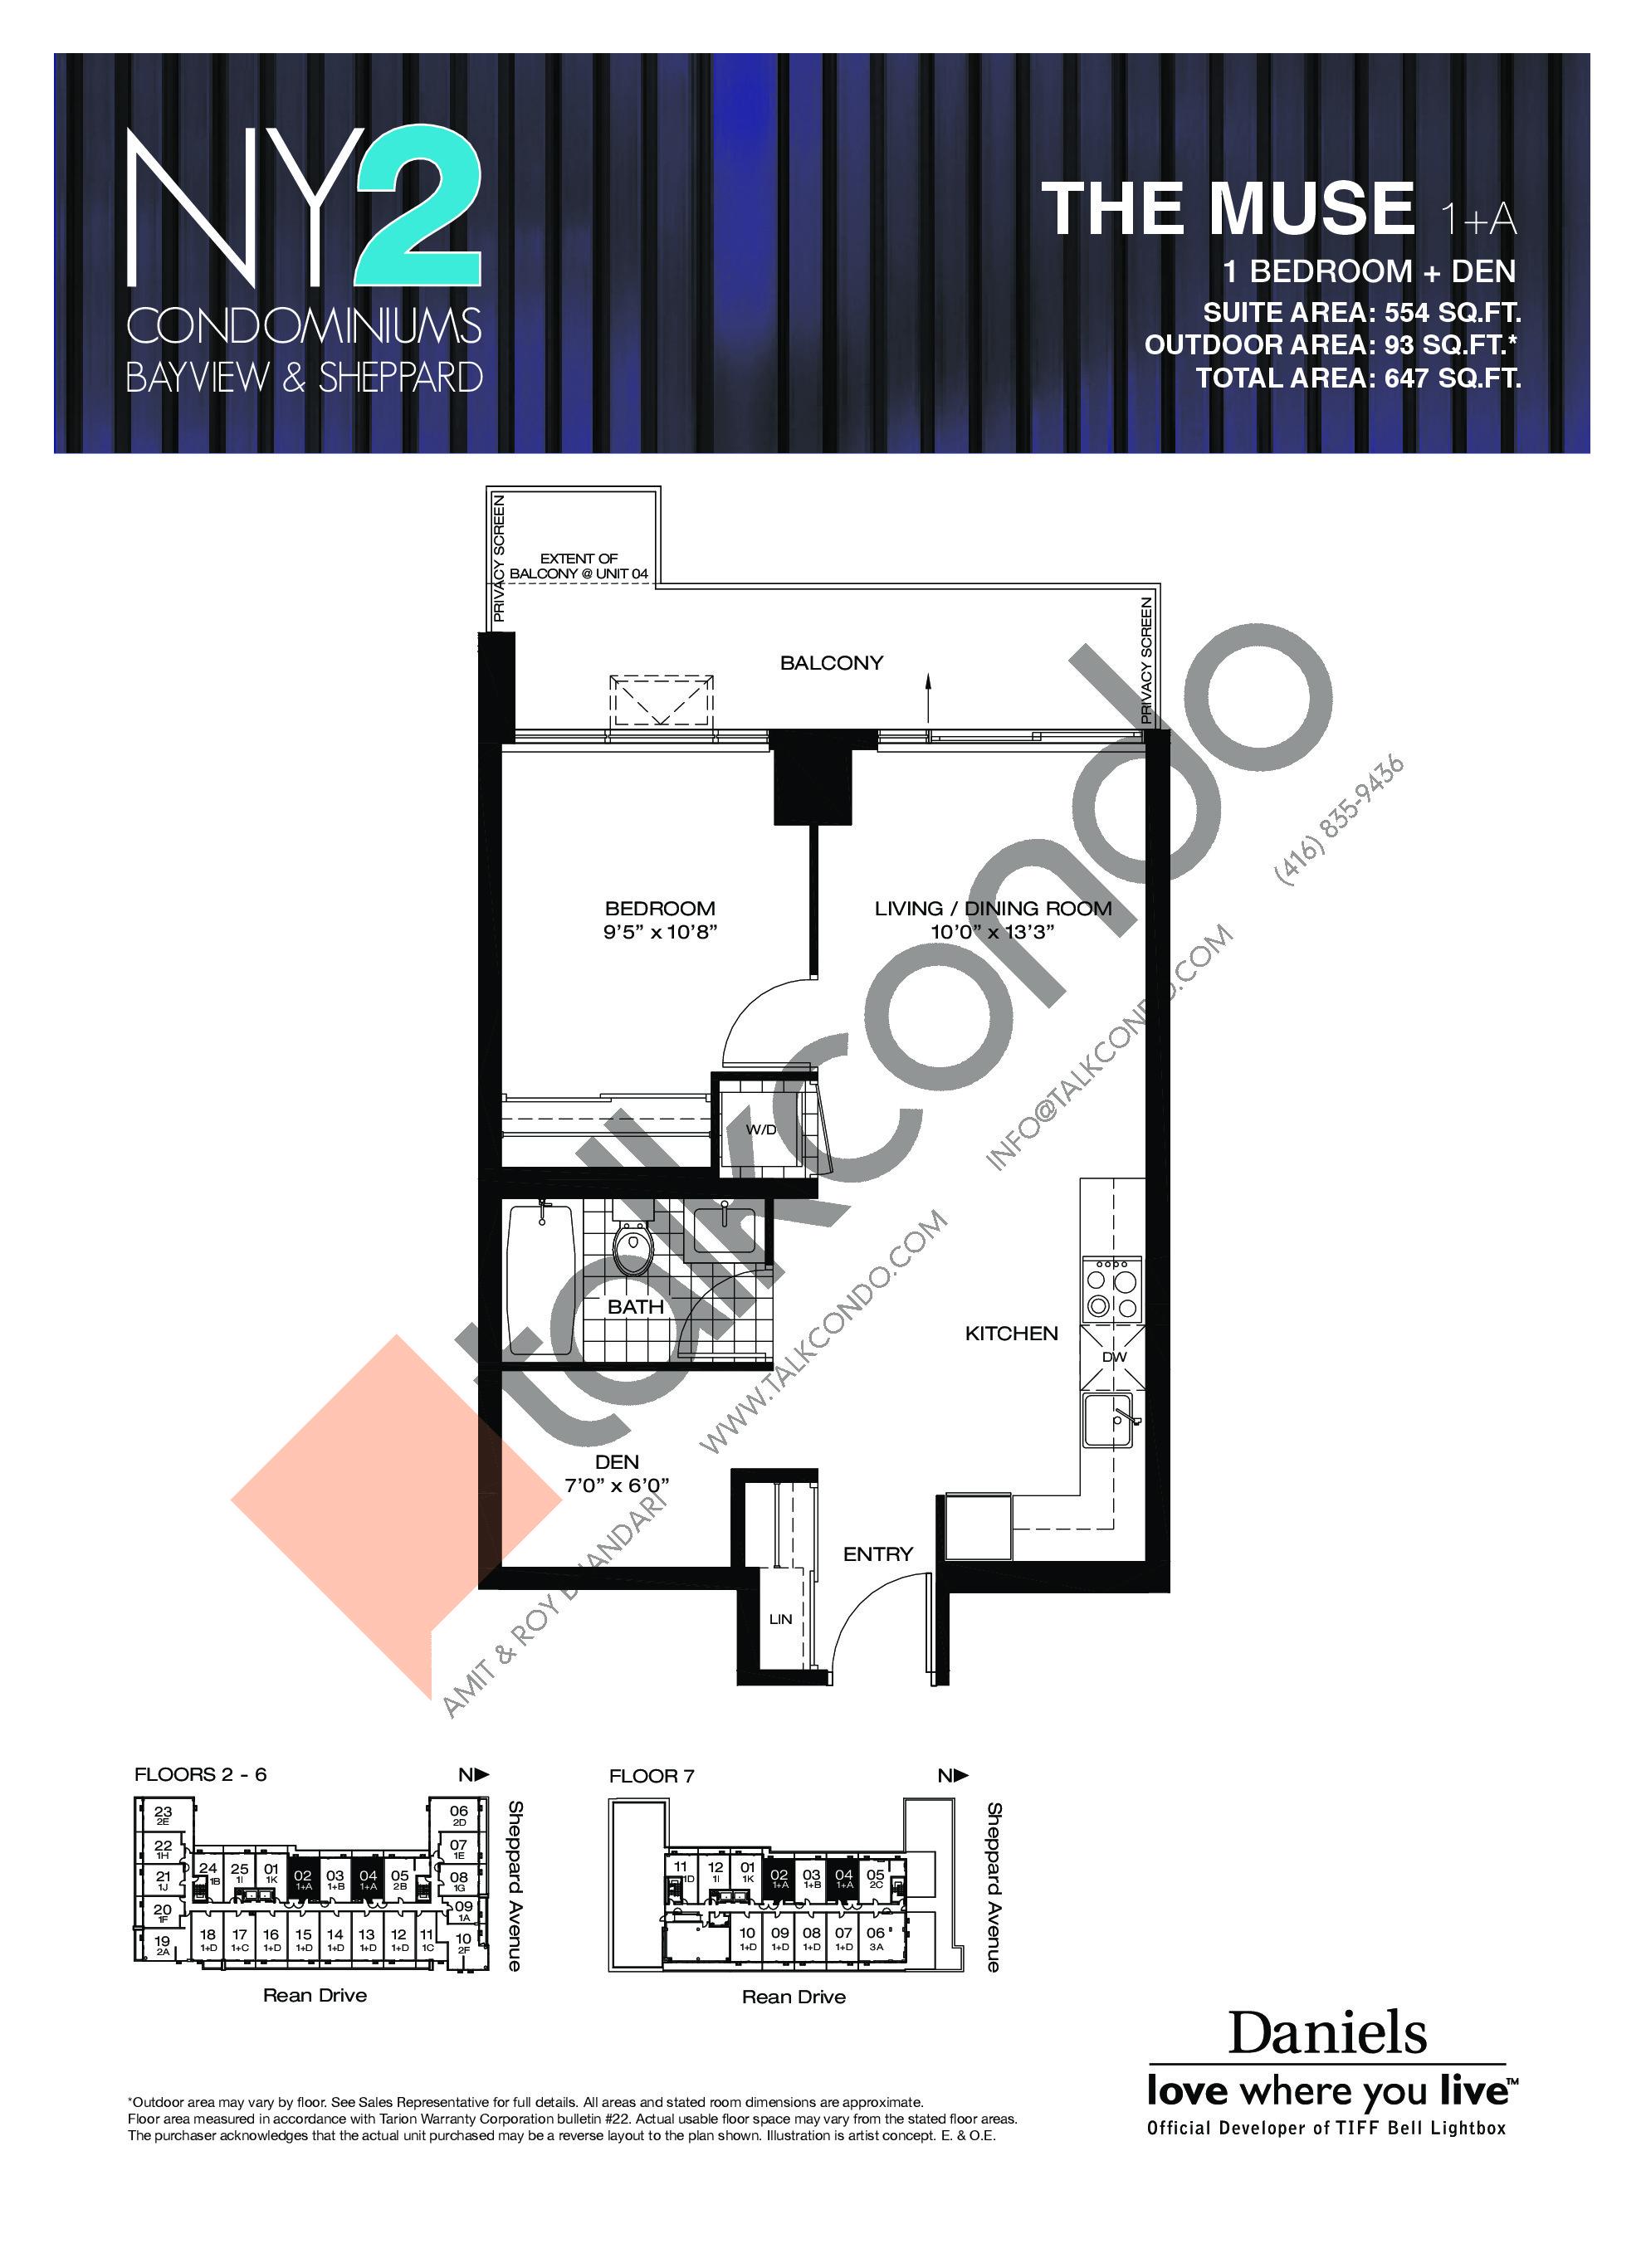 Ny2 Condos The Muse 554 Sq Ft 1 5 Bedrooms